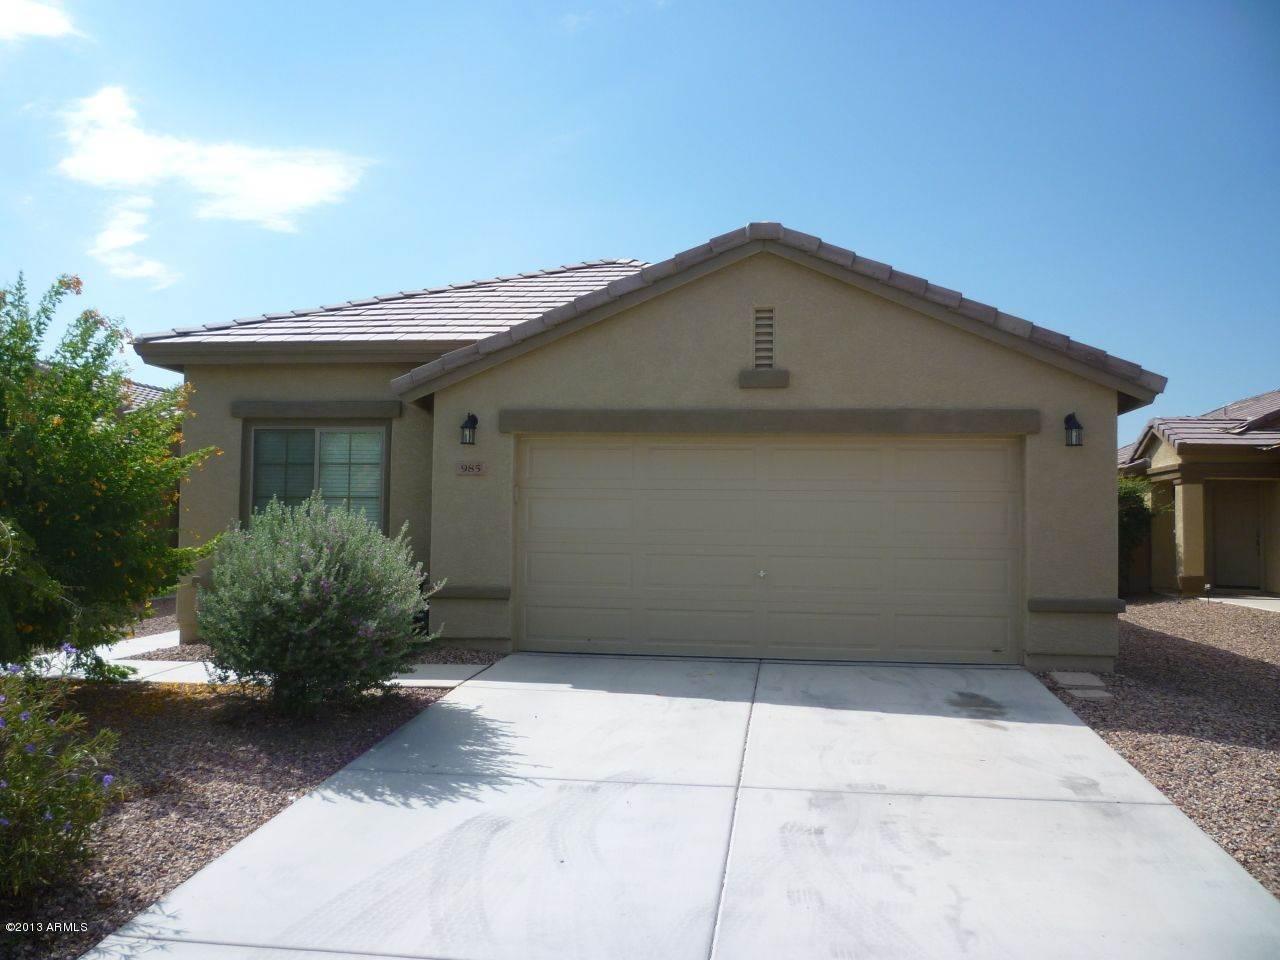 985 W Desert Hills Dr, San Tan Valley, AZ 85143